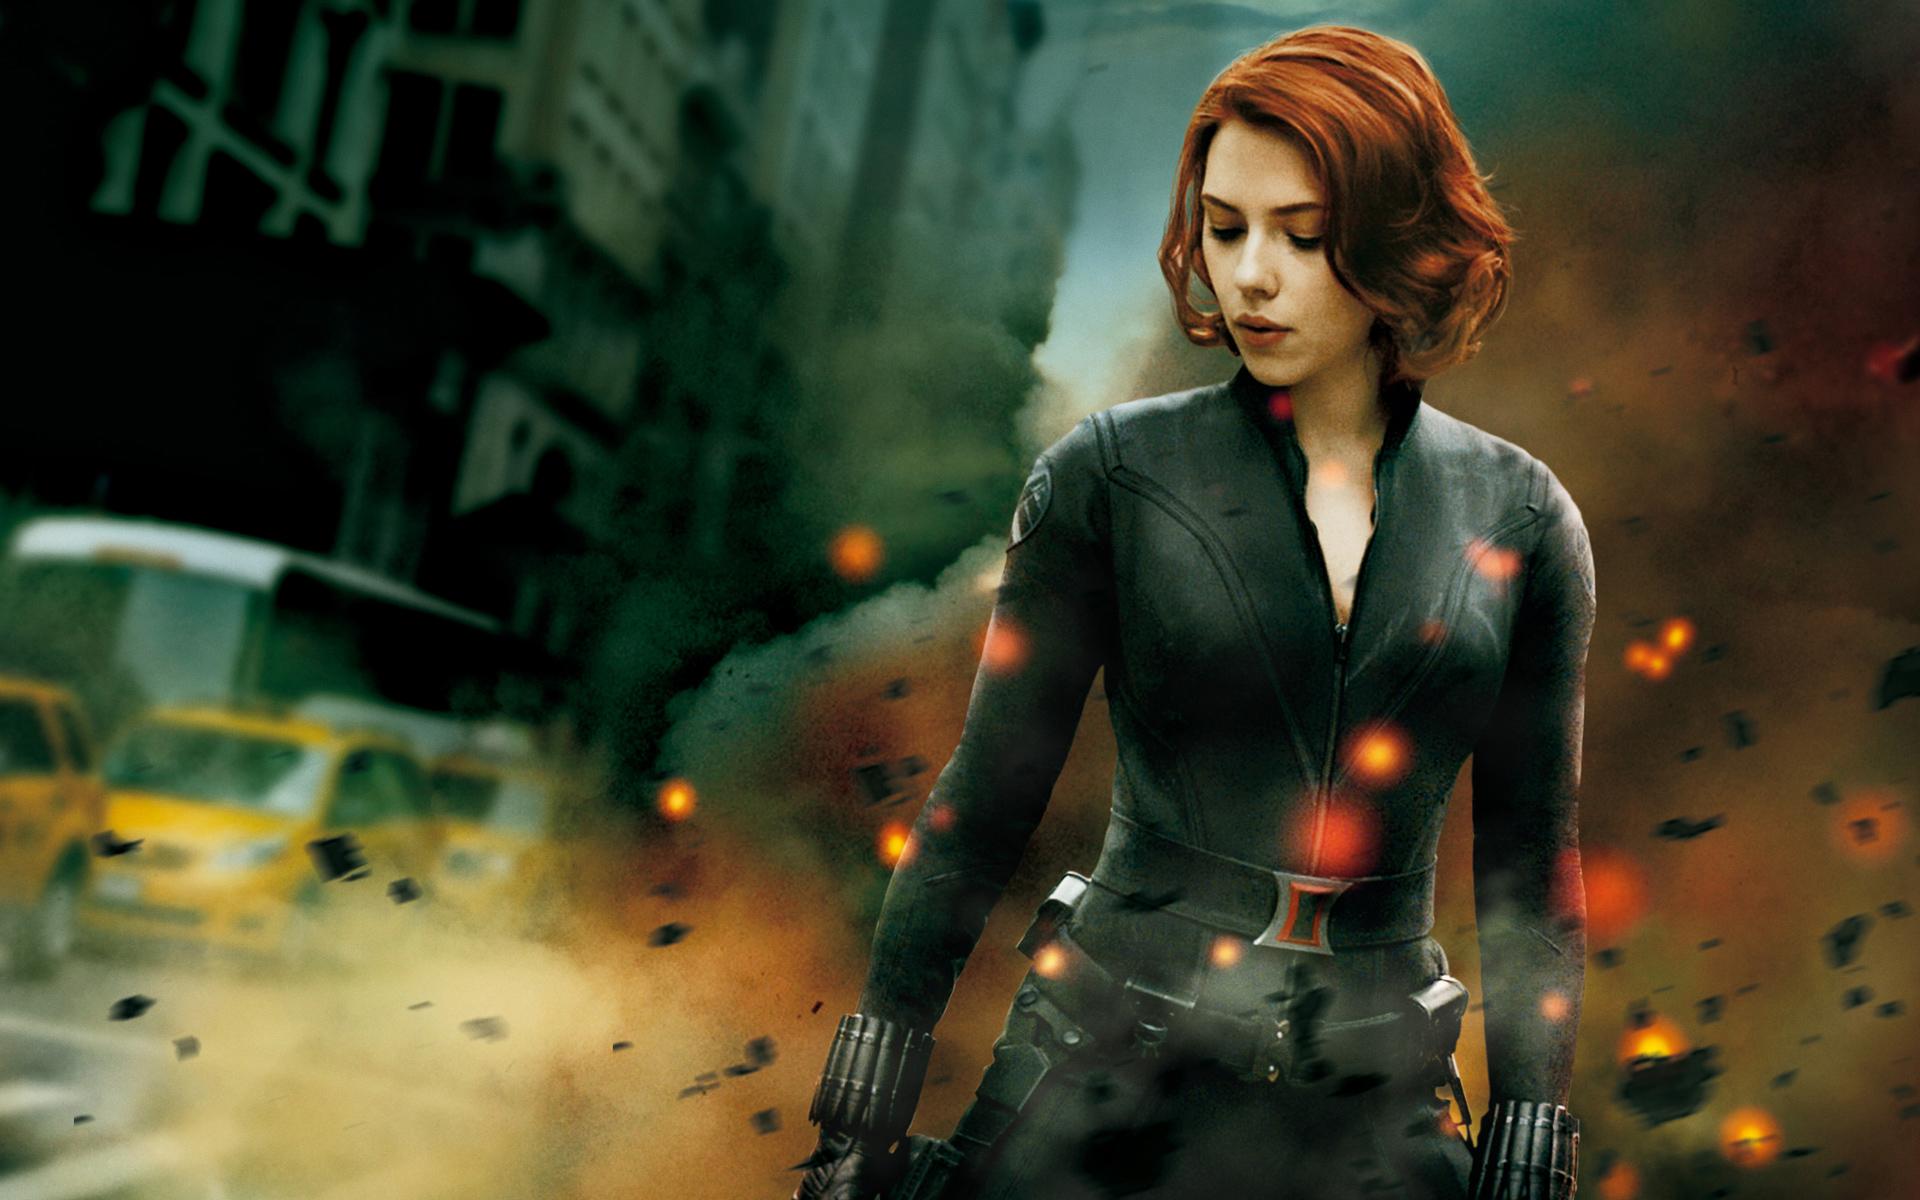 The Avengers Black Widow wallpaper